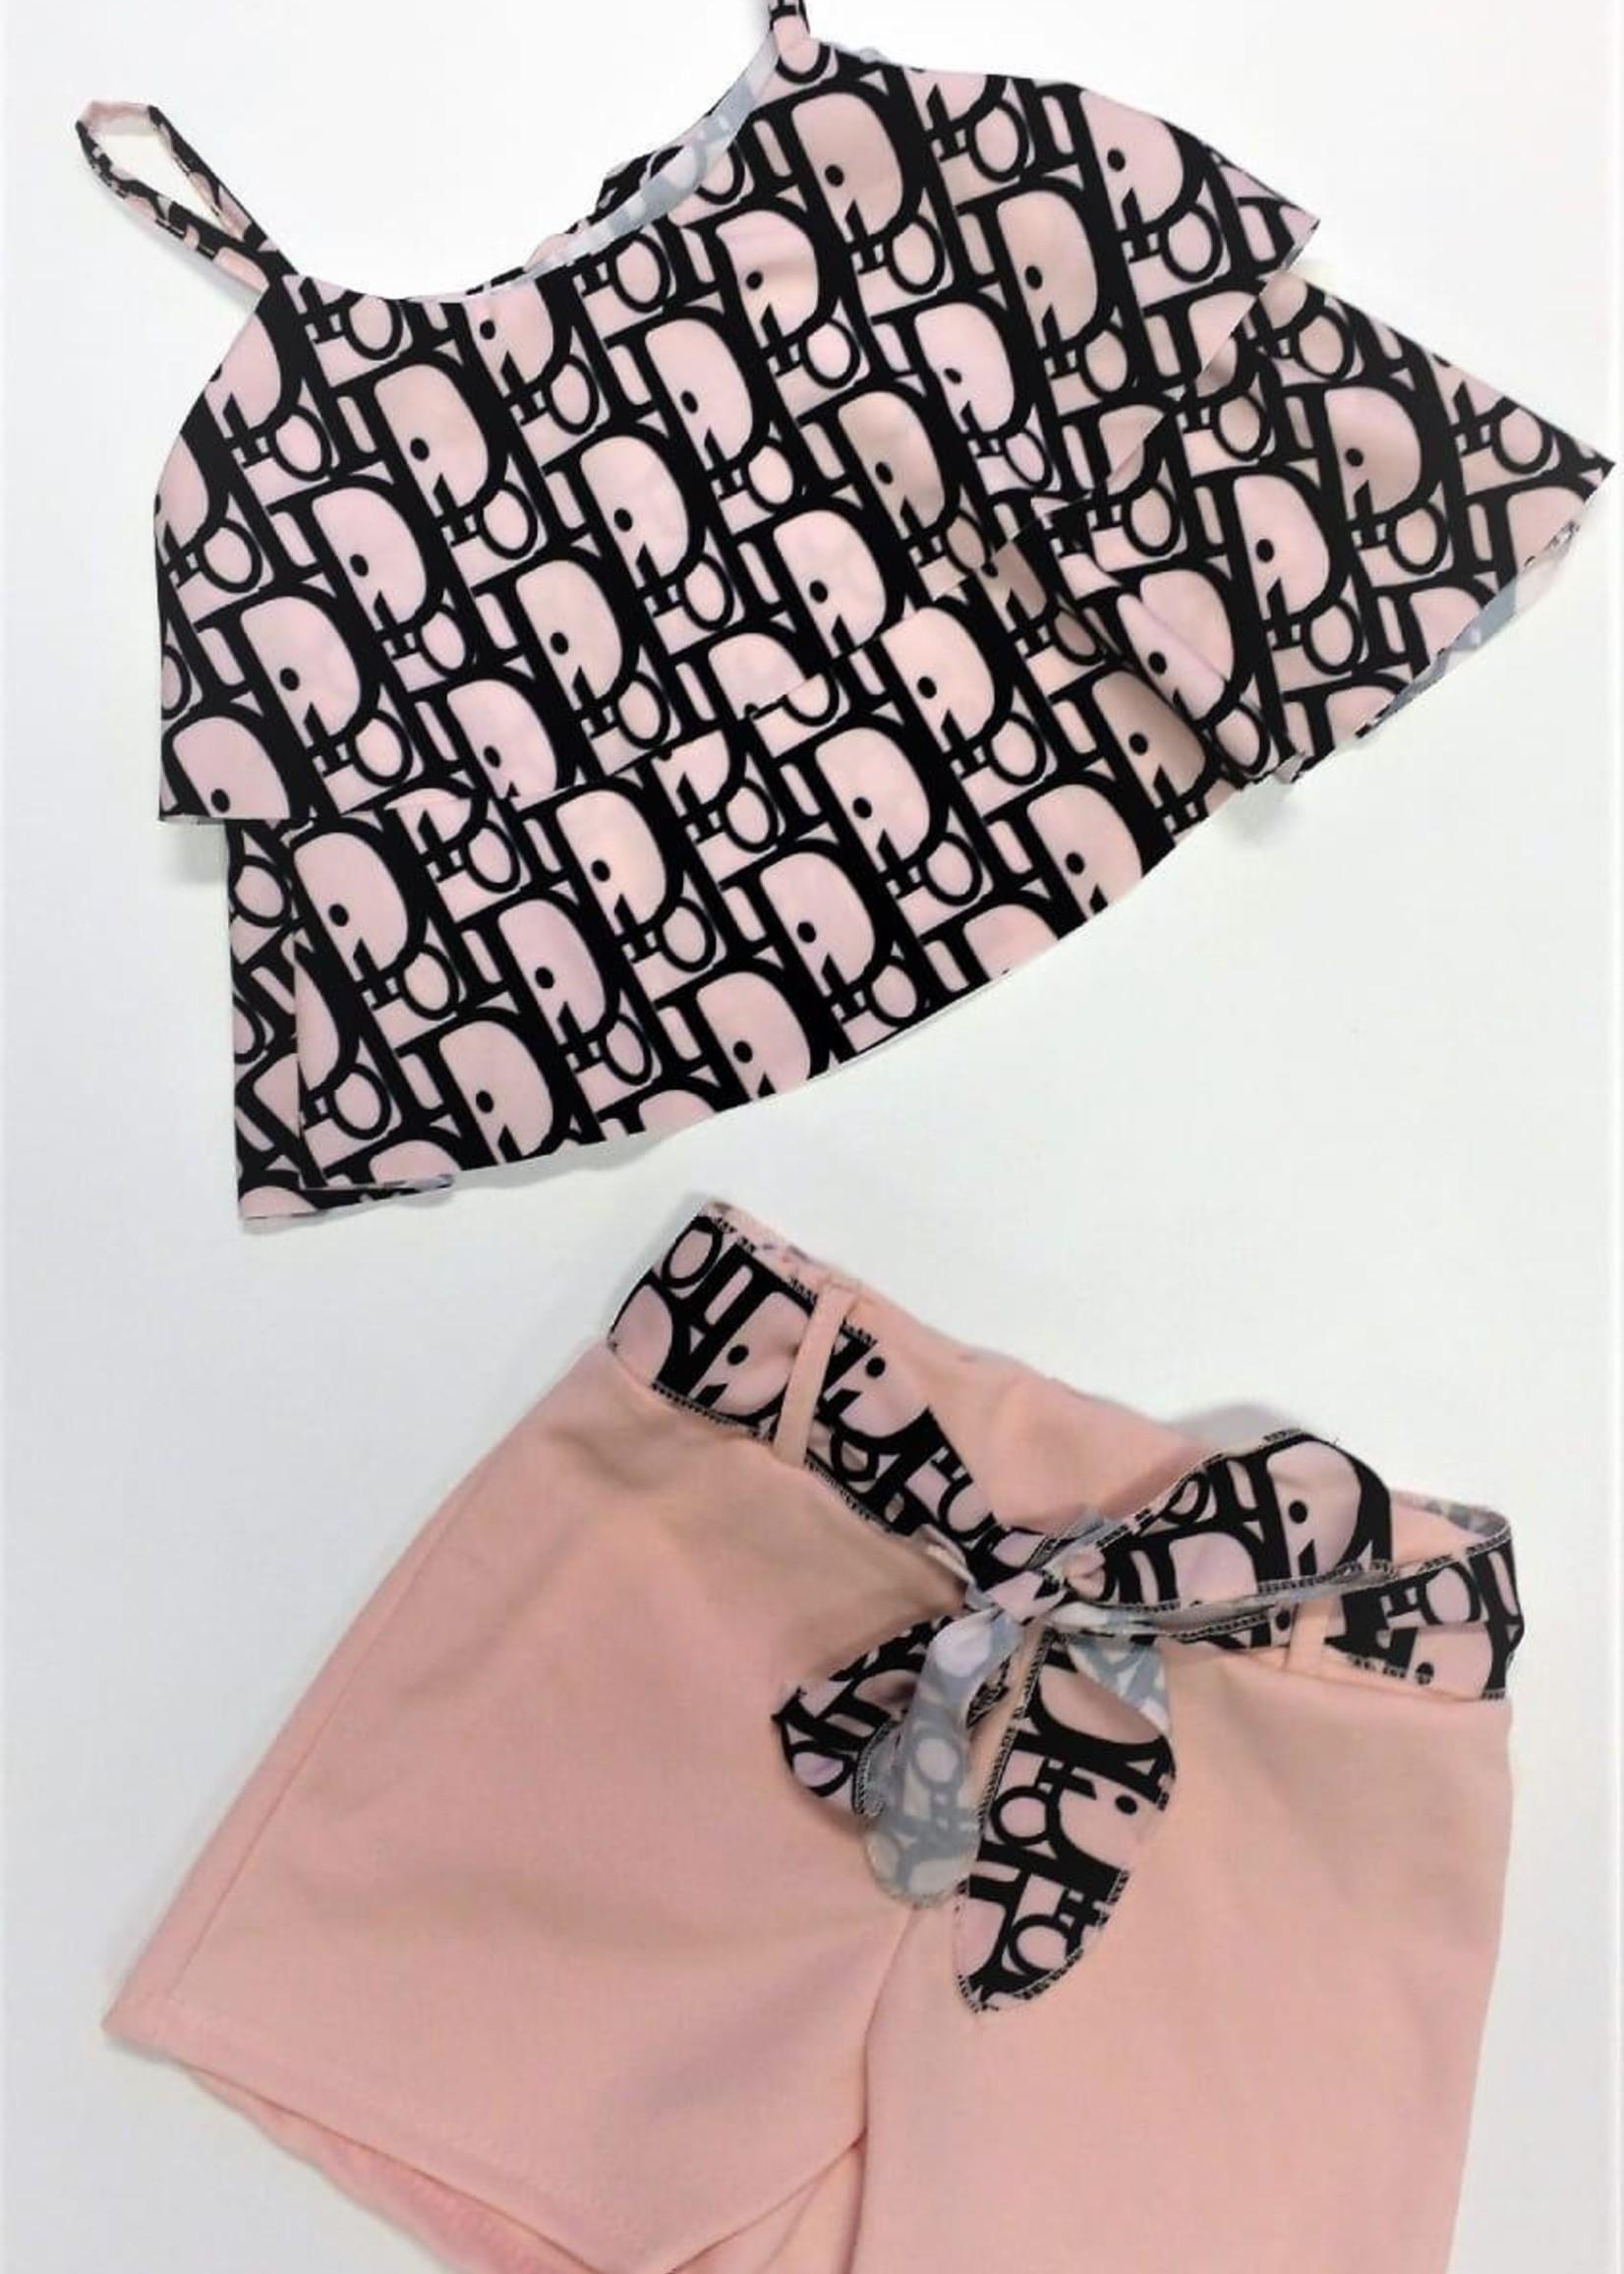 Divanis Divanis look a like D set pink